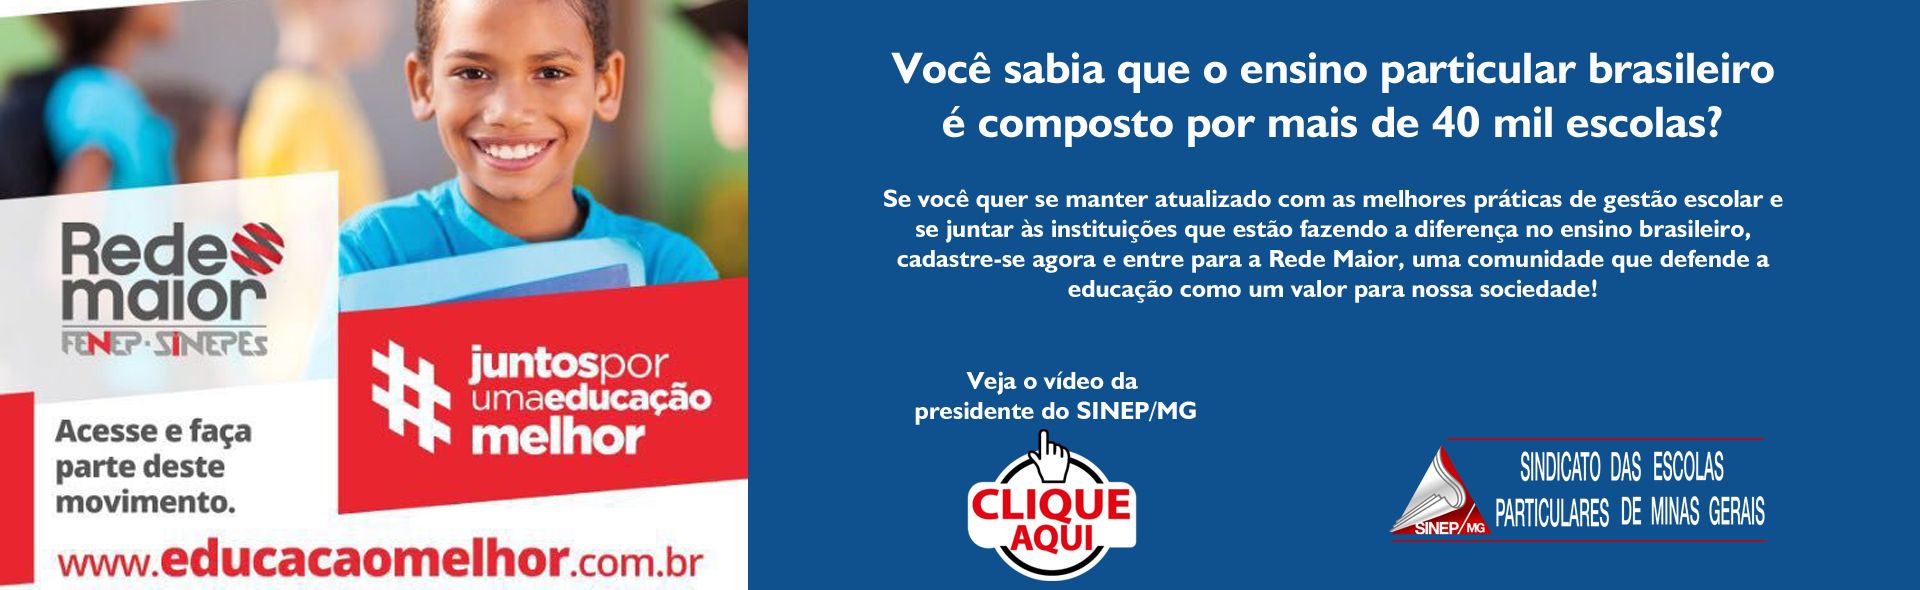 destaque/plusfiles/rede-maior.png